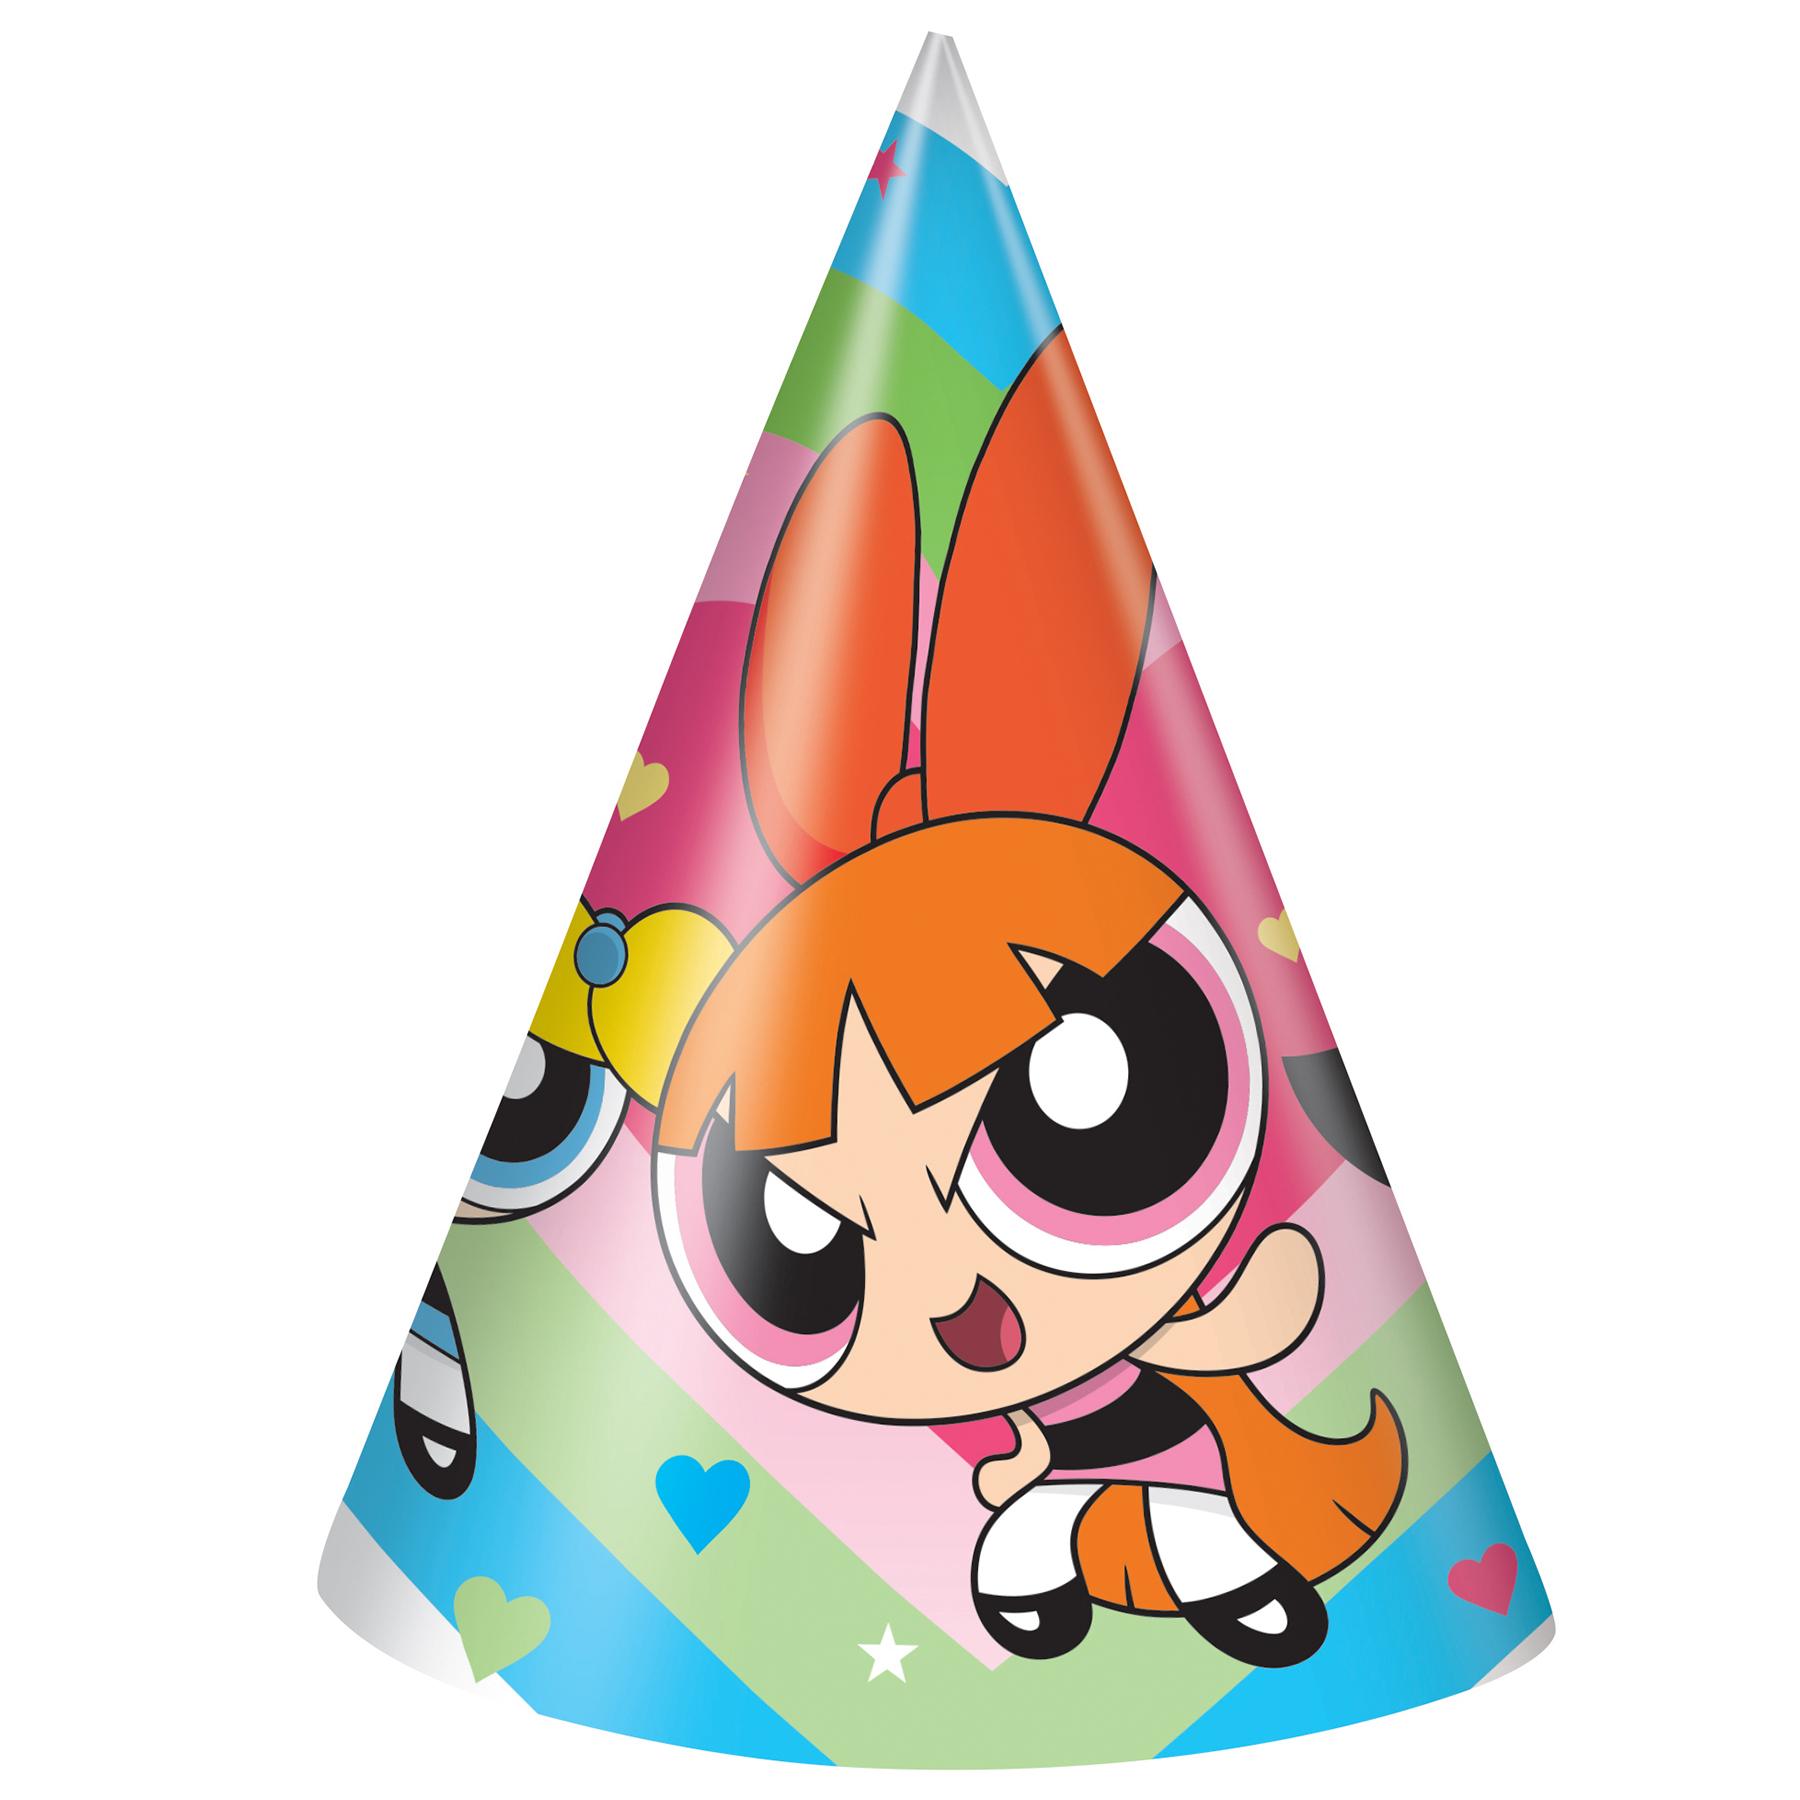 1800x1800 Powerpuff Girls Birthday Hats Powerpuff Girls Party Accessories